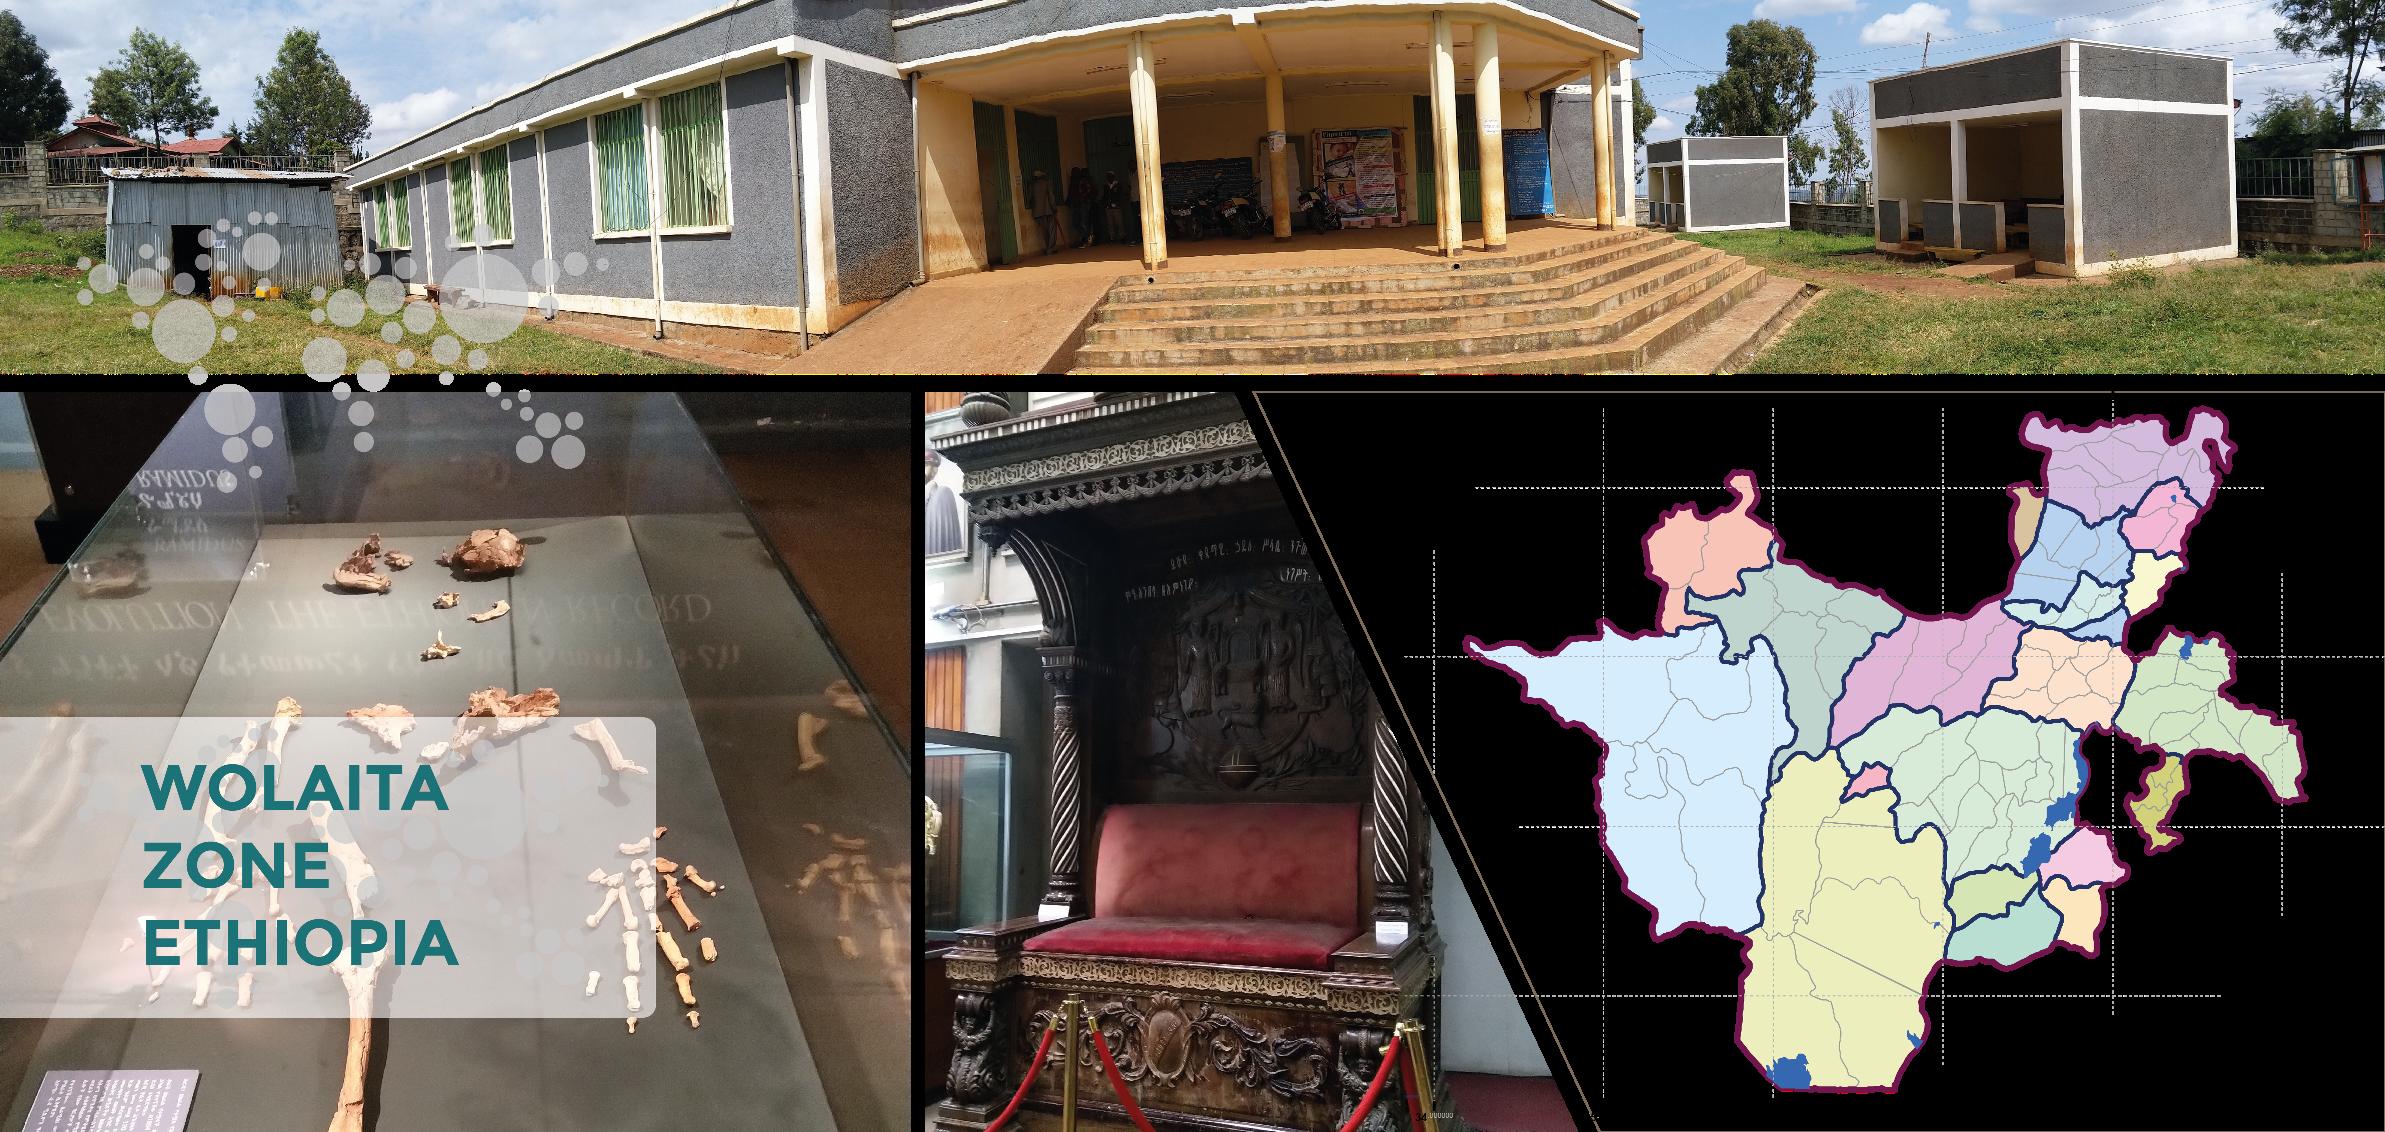 Overview Wolaita, Ethiopia - BRTE Project